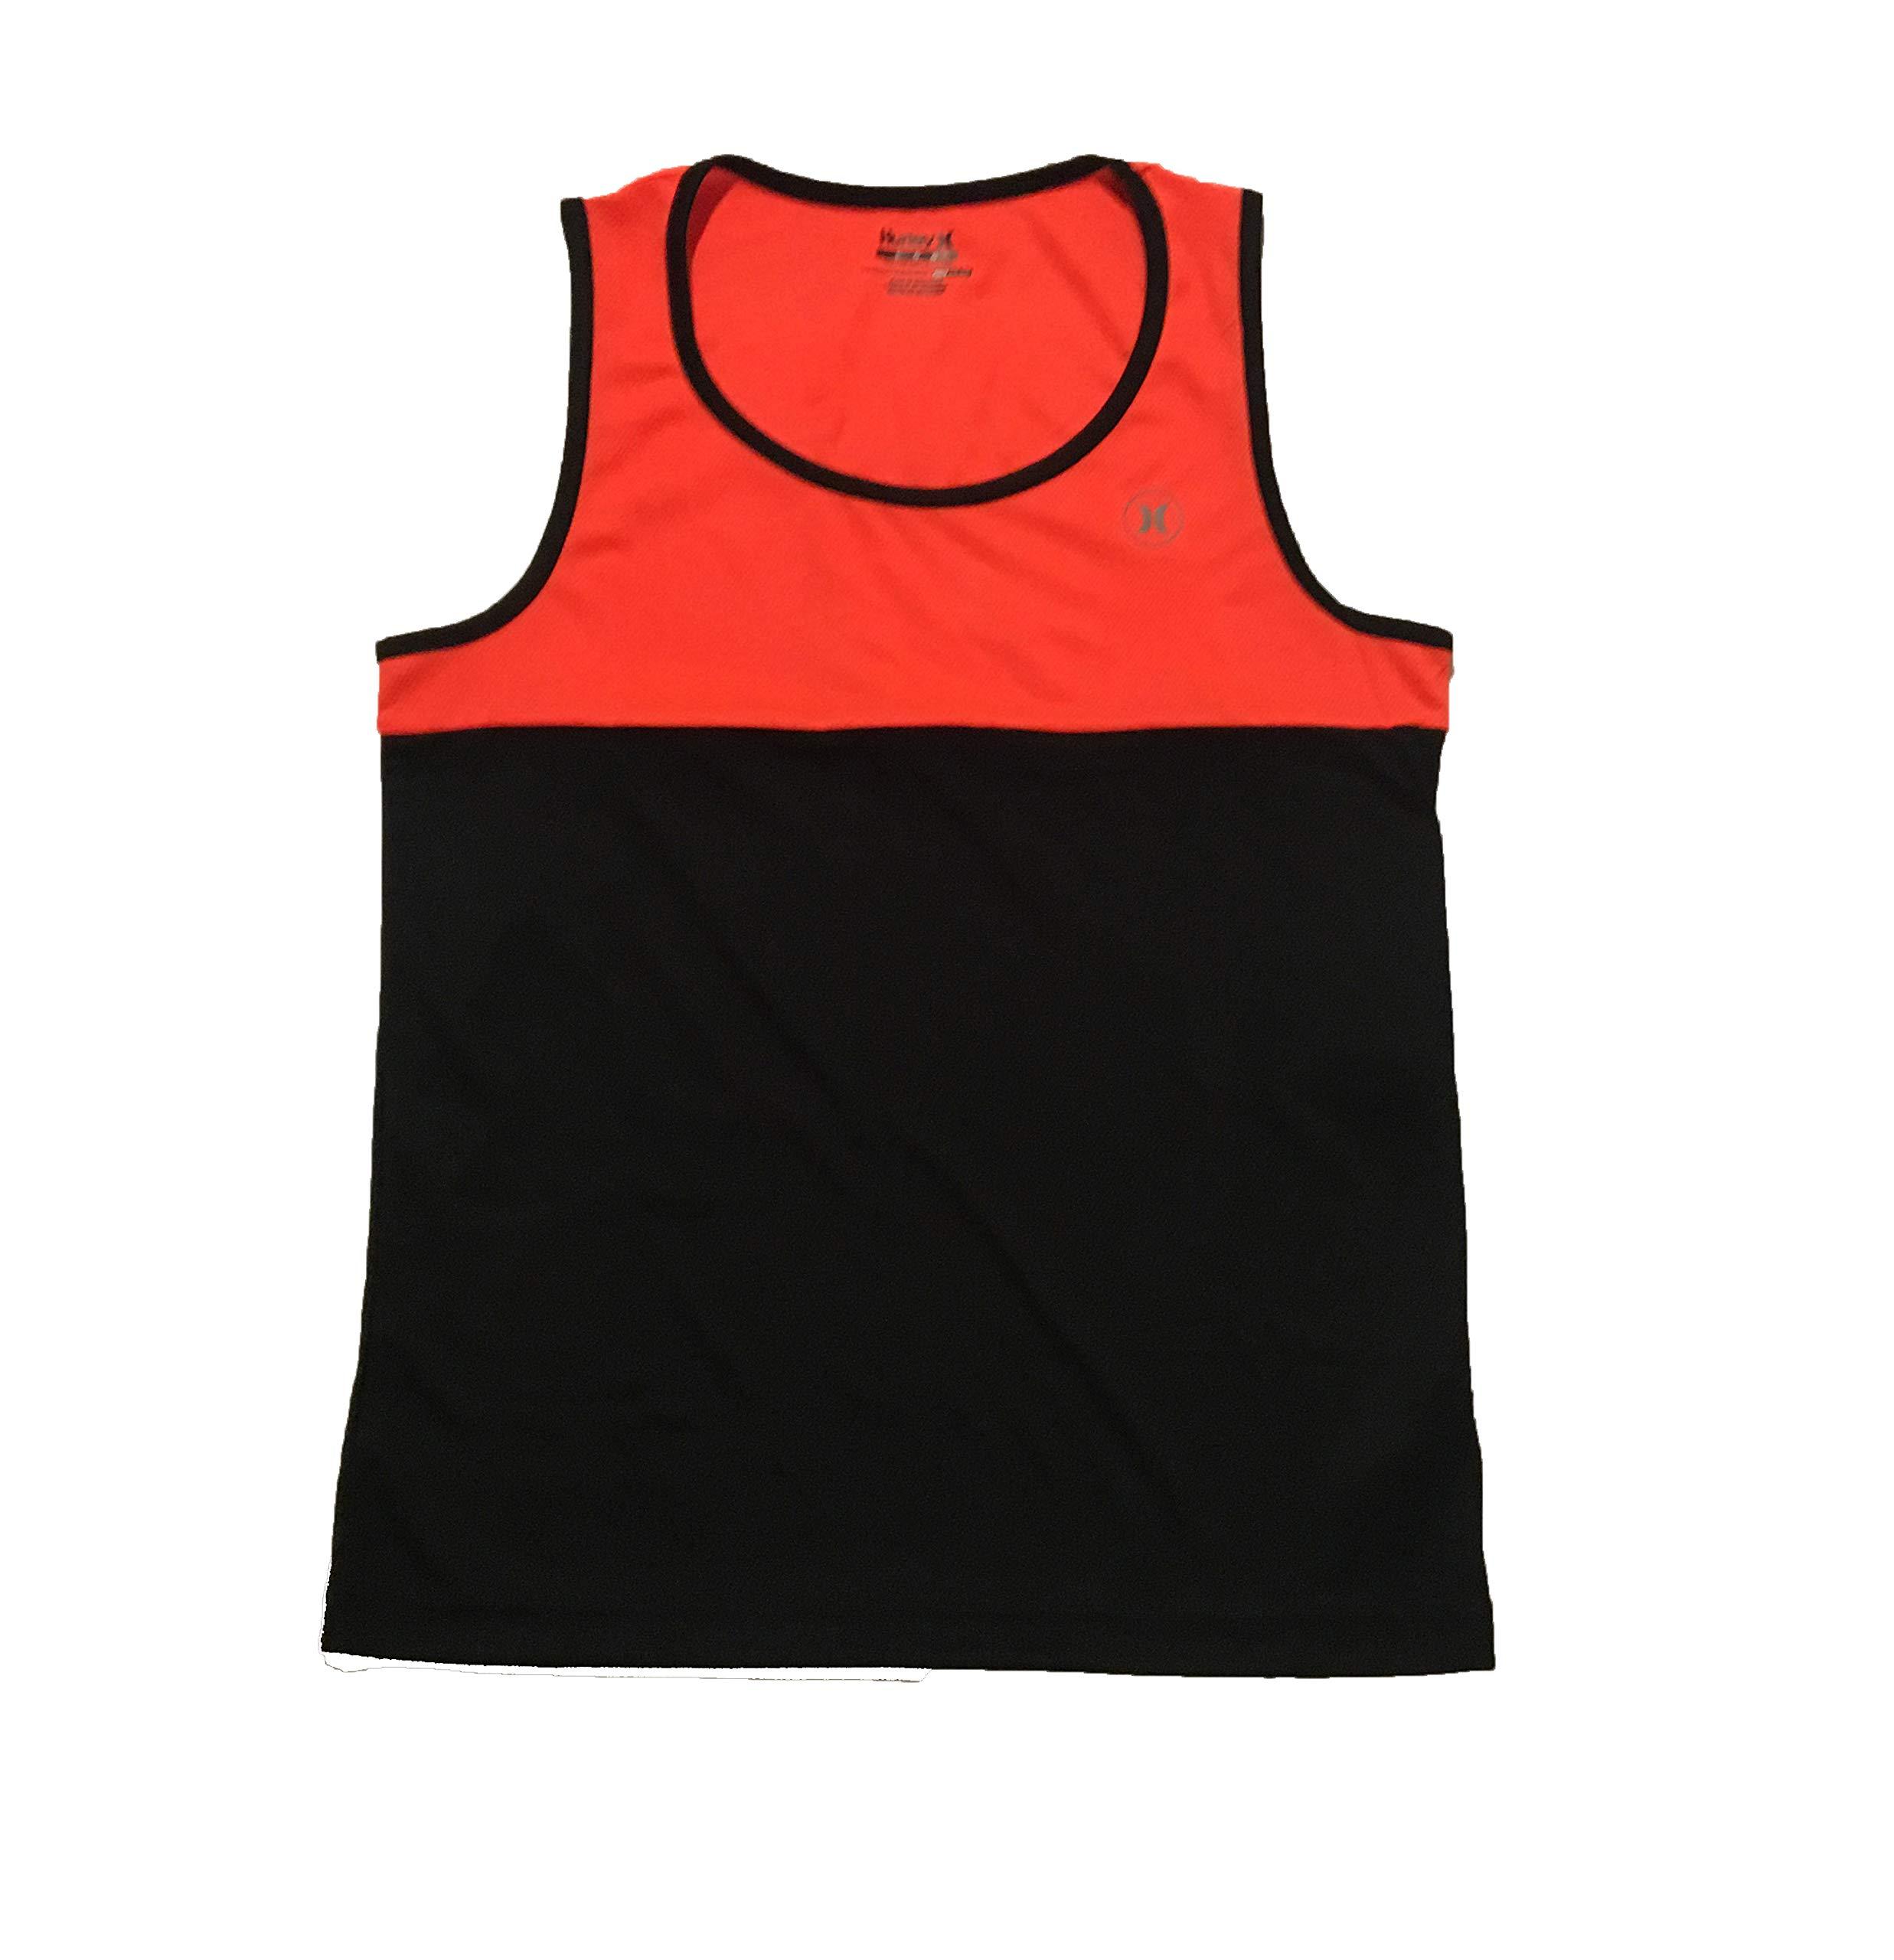 Hurley Boys Dri-Fit Tank Top Black Large (12-13 Years)